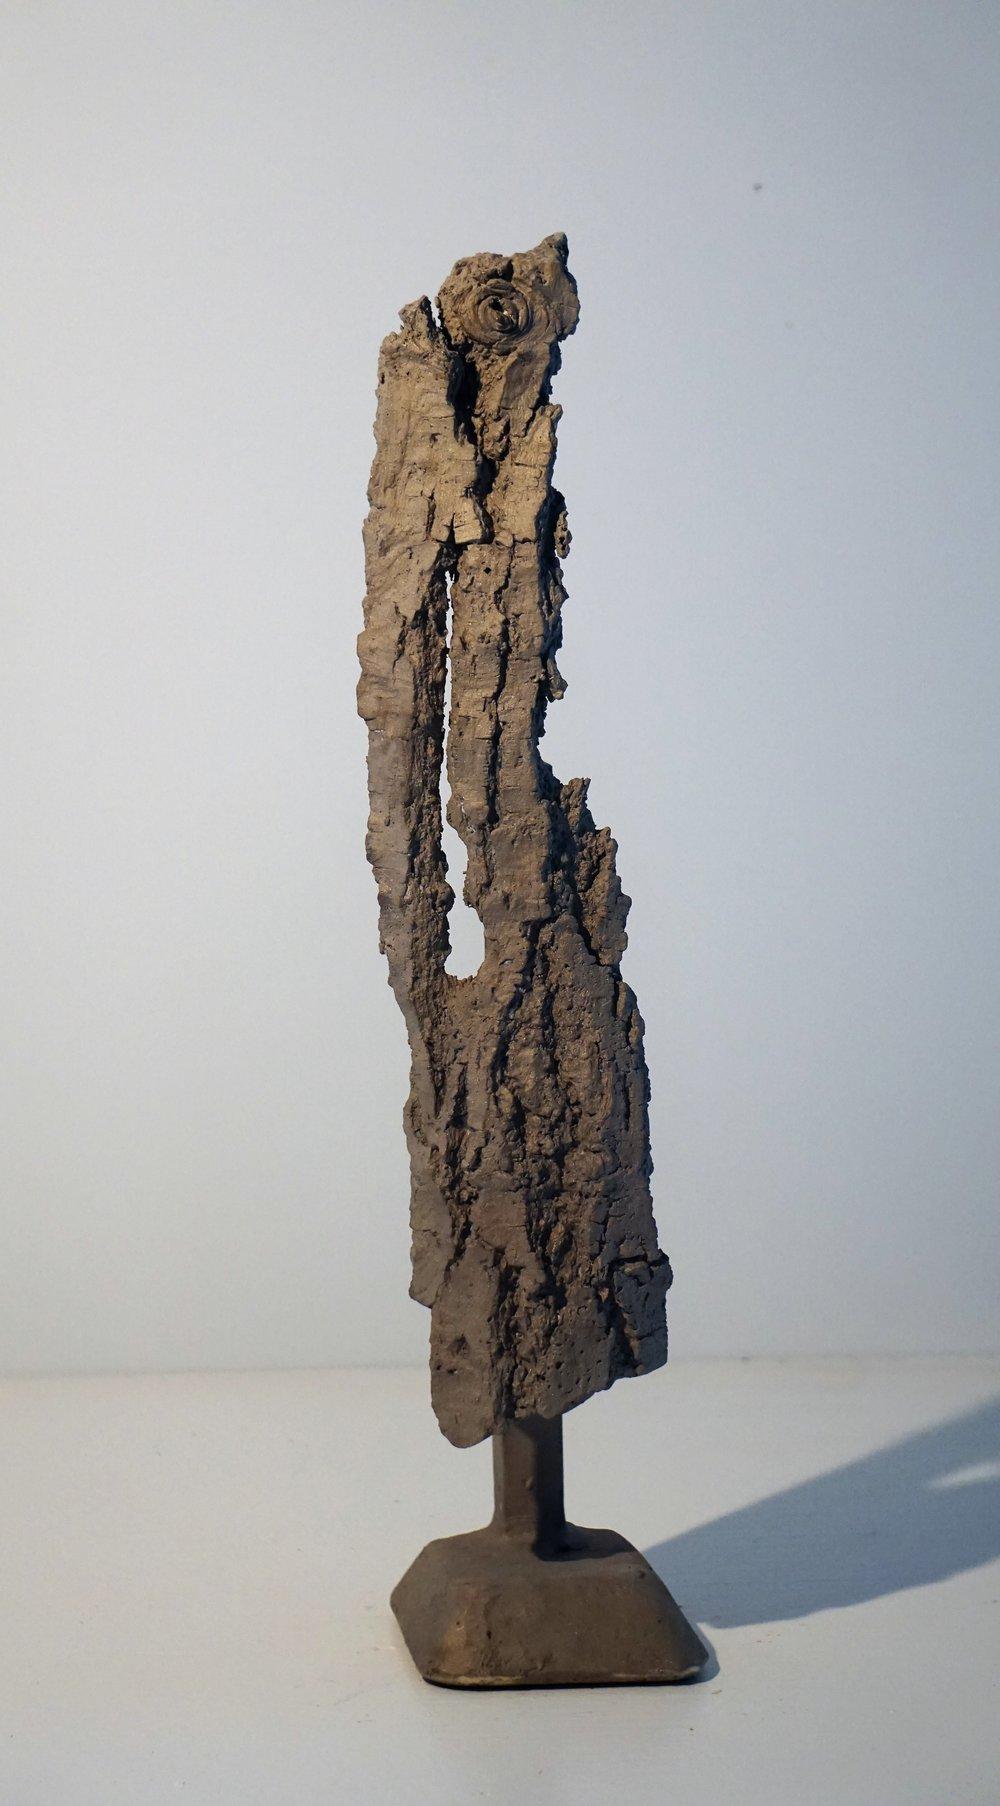 Bark #17